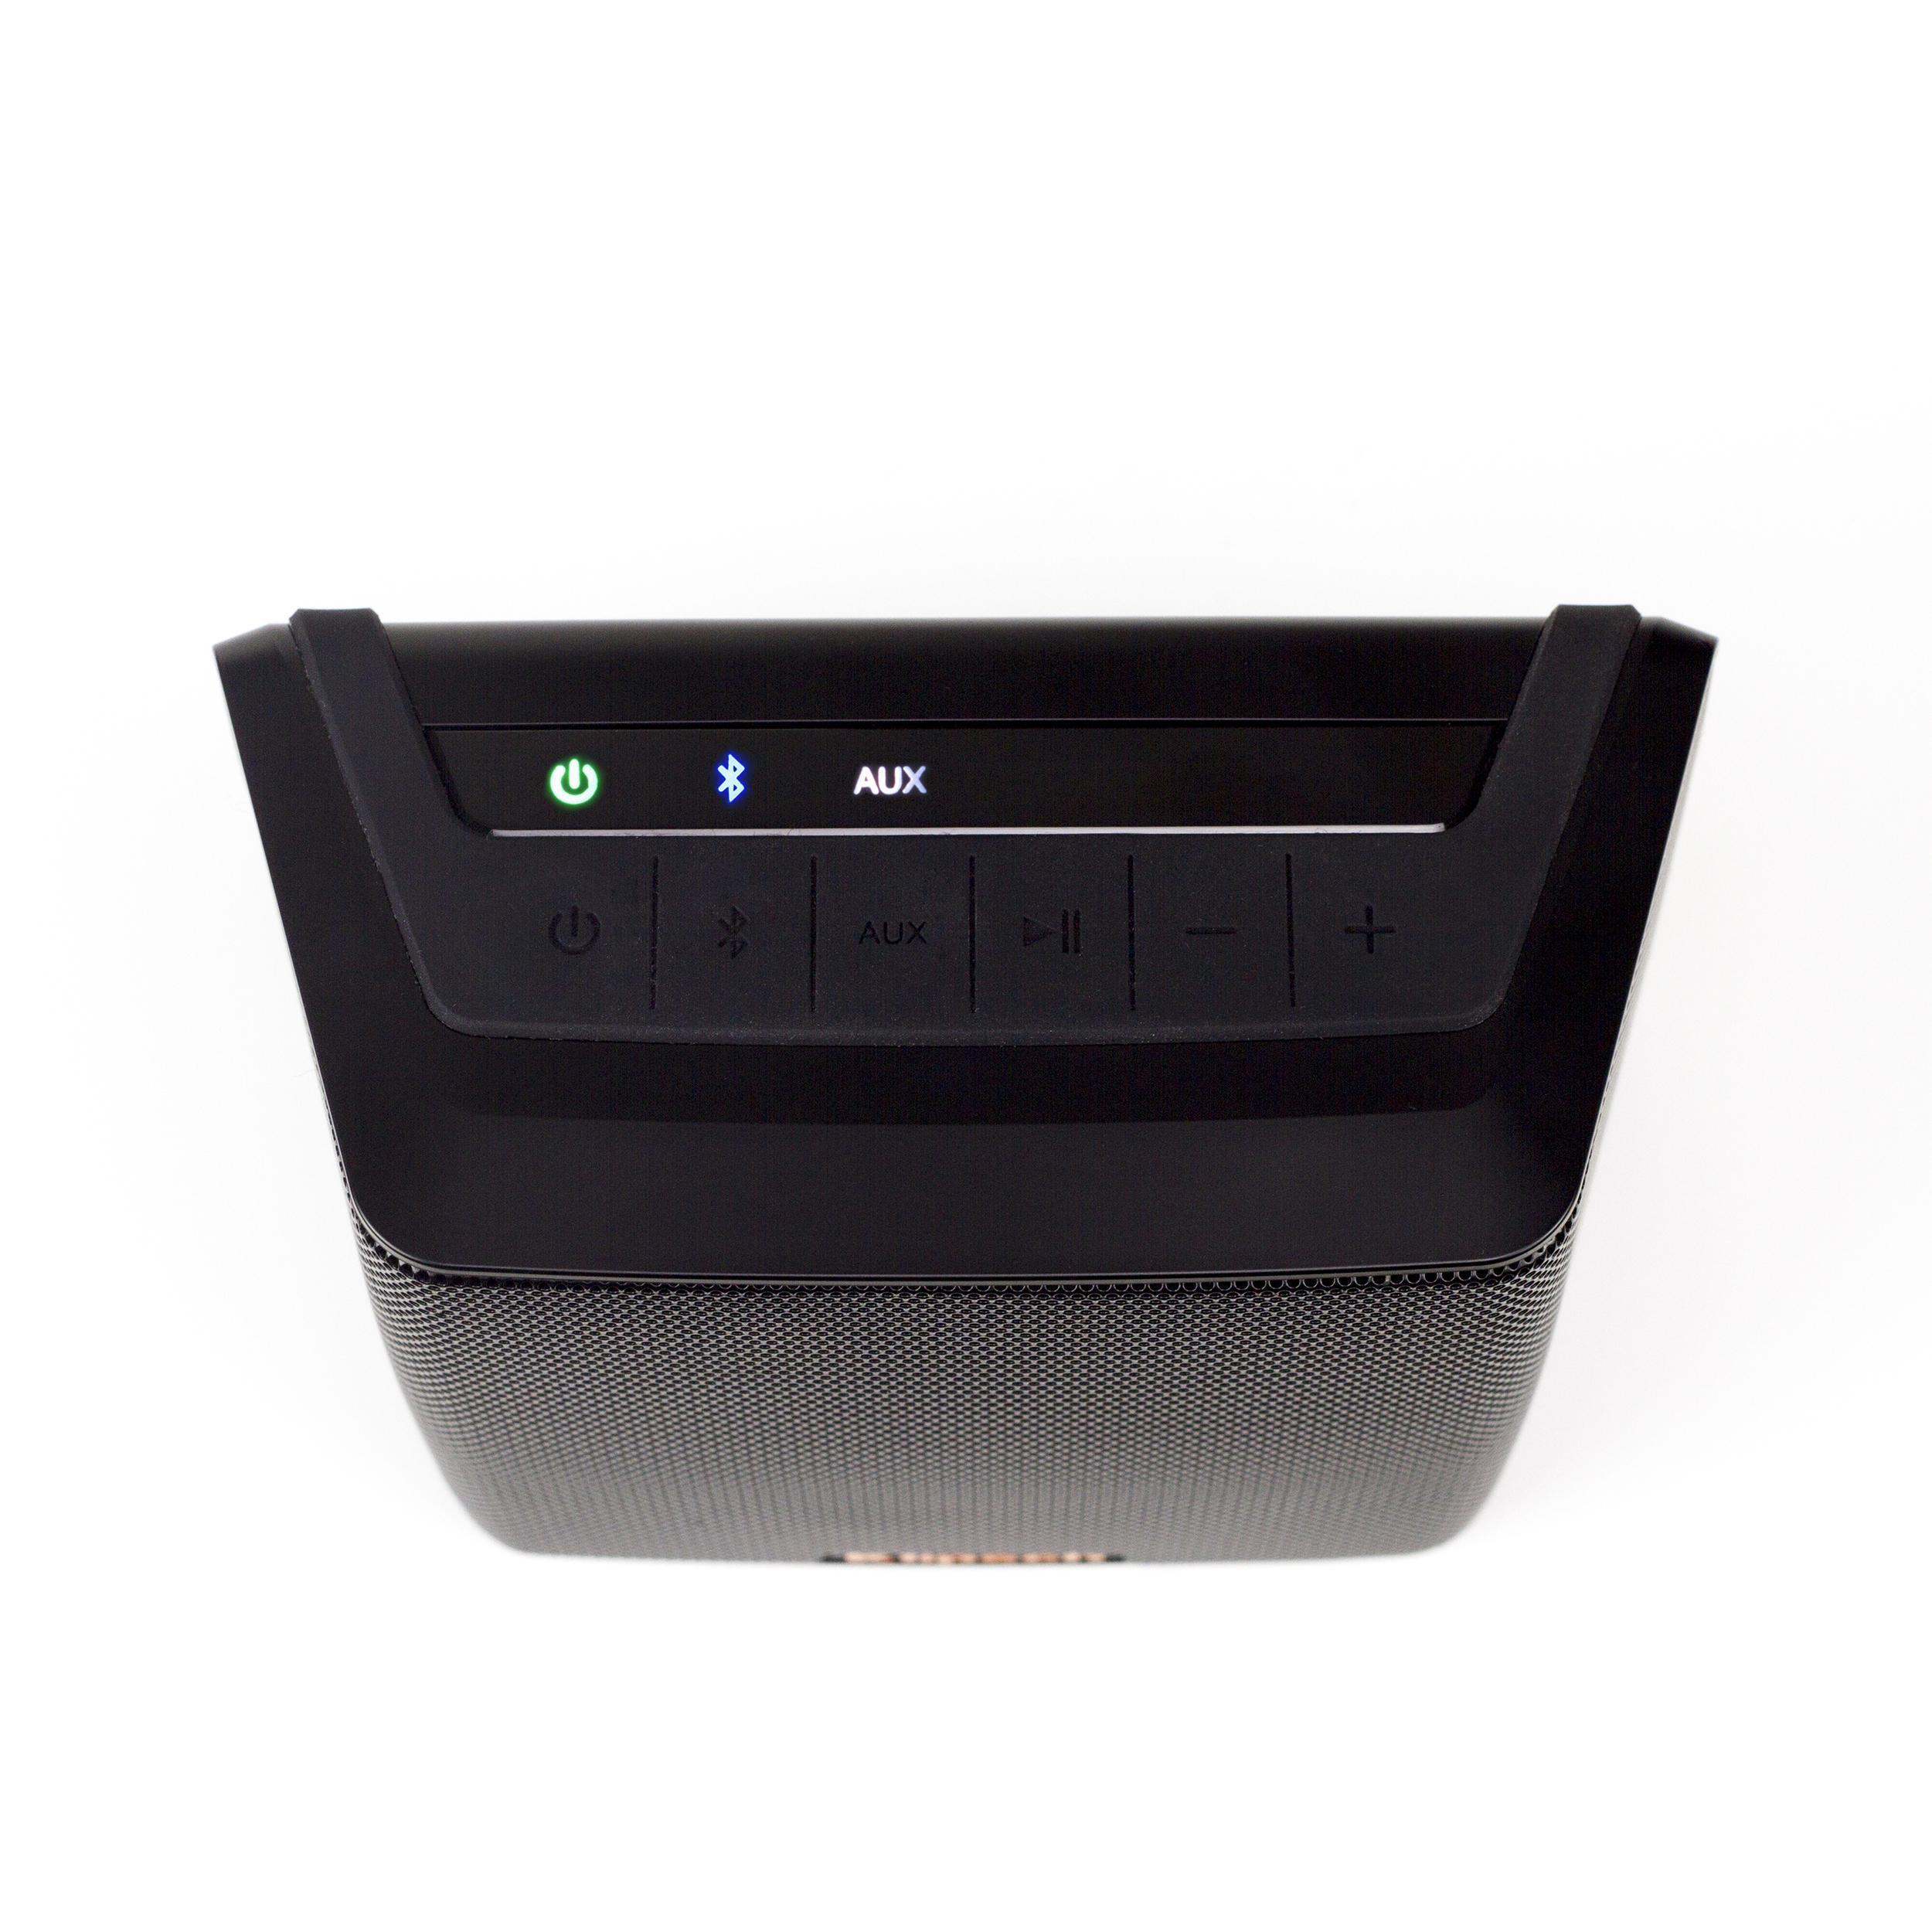 Amazon.com: Klipsch Groove Portable Bluetooth Speaker: Home Audio & Theater